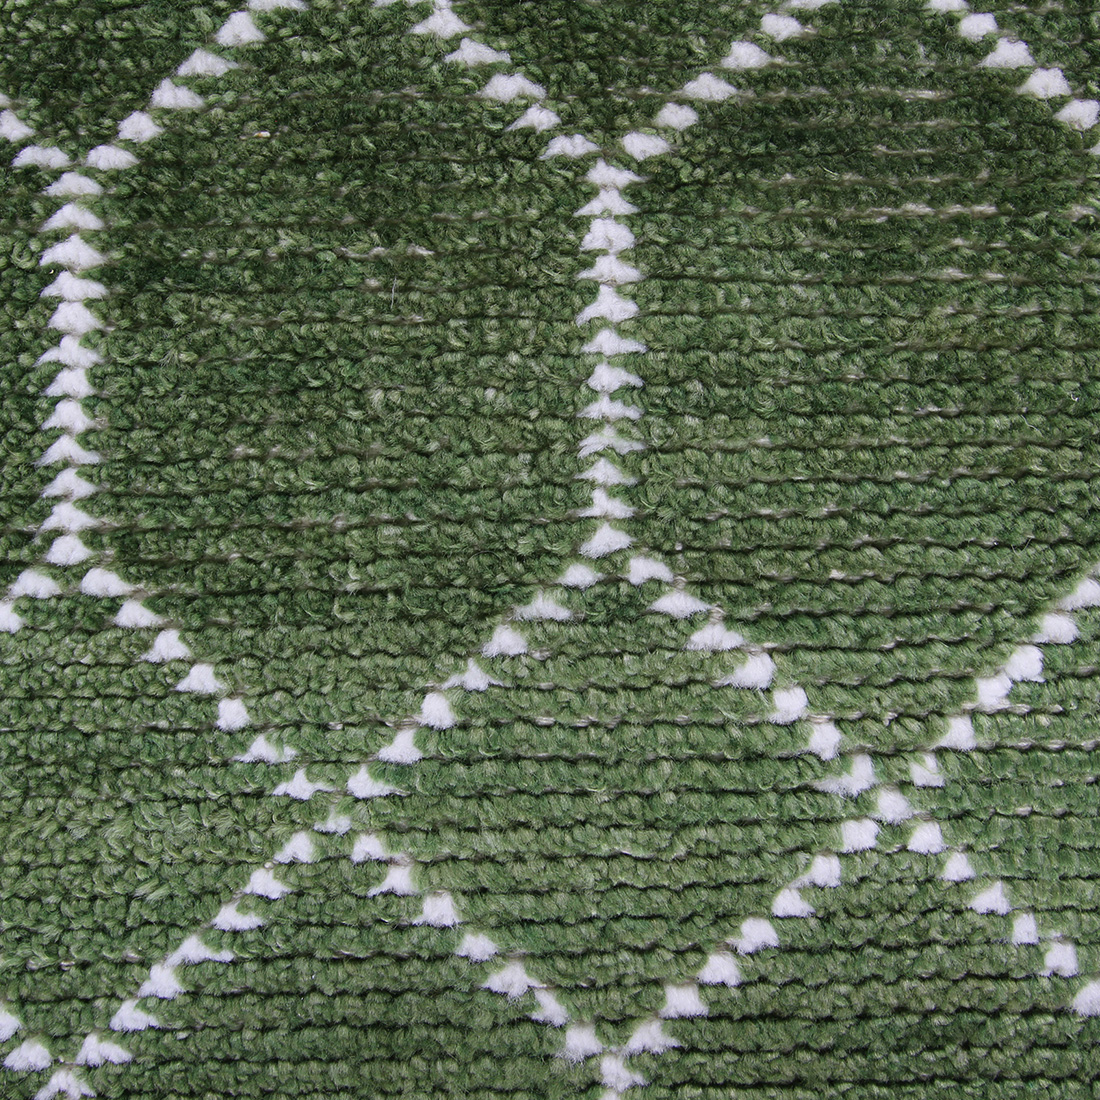 Vloerkleed Brinker Laatz Army Green | 240 x 340 cm